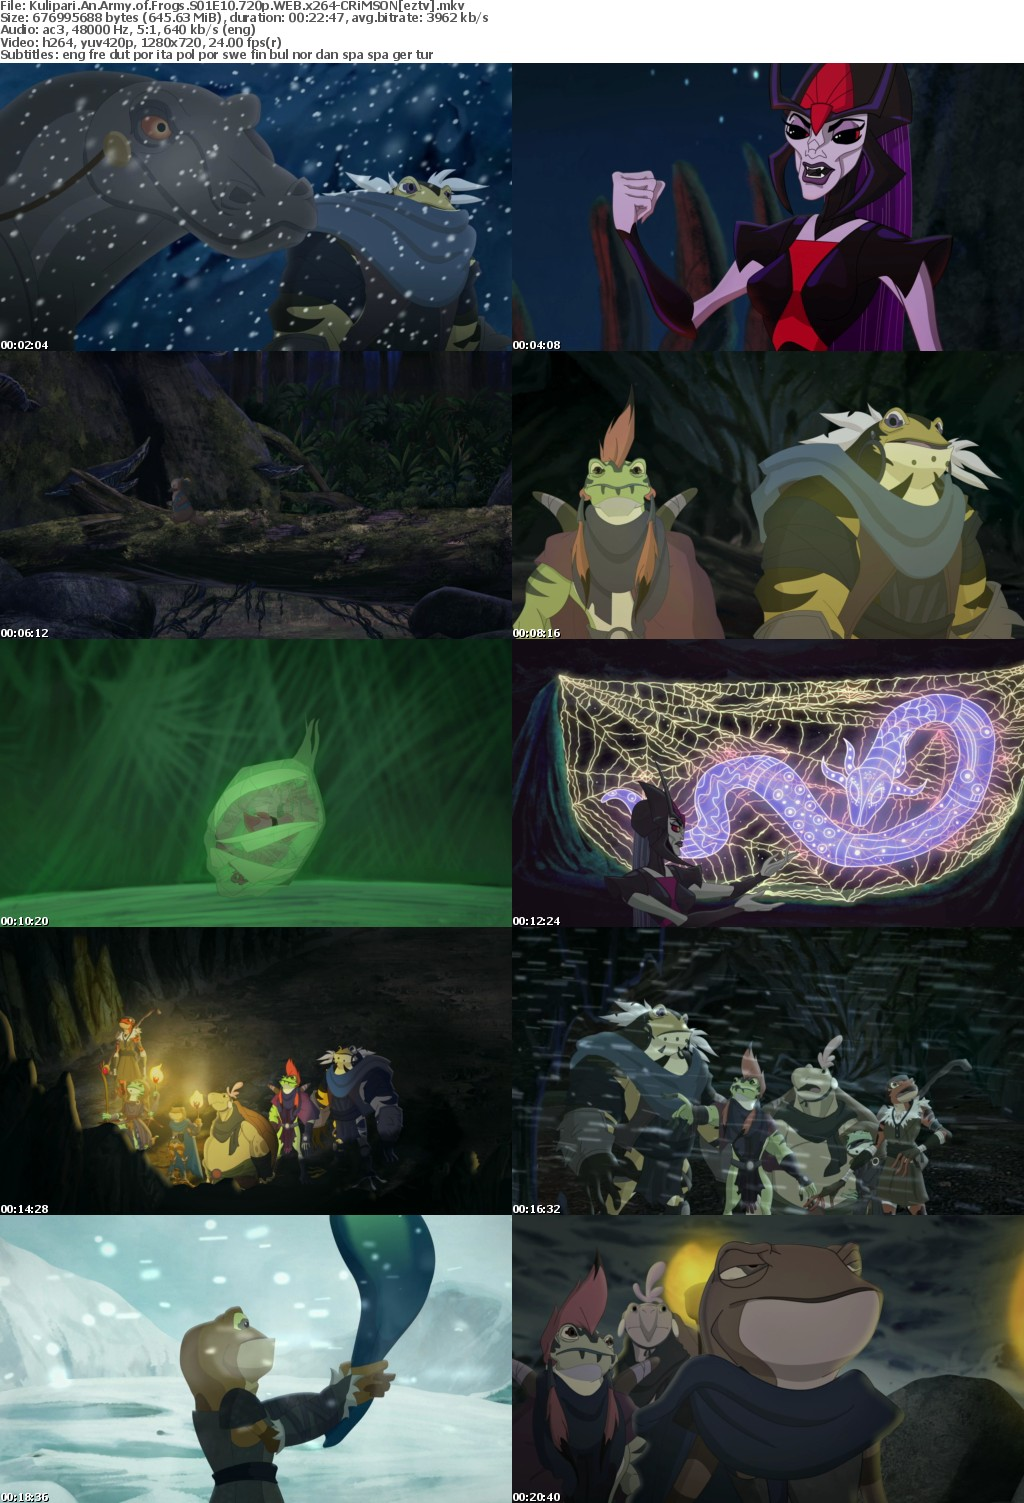 Kulipari An Army of Frogs S01E10 720p WEB x264-CRiMSON